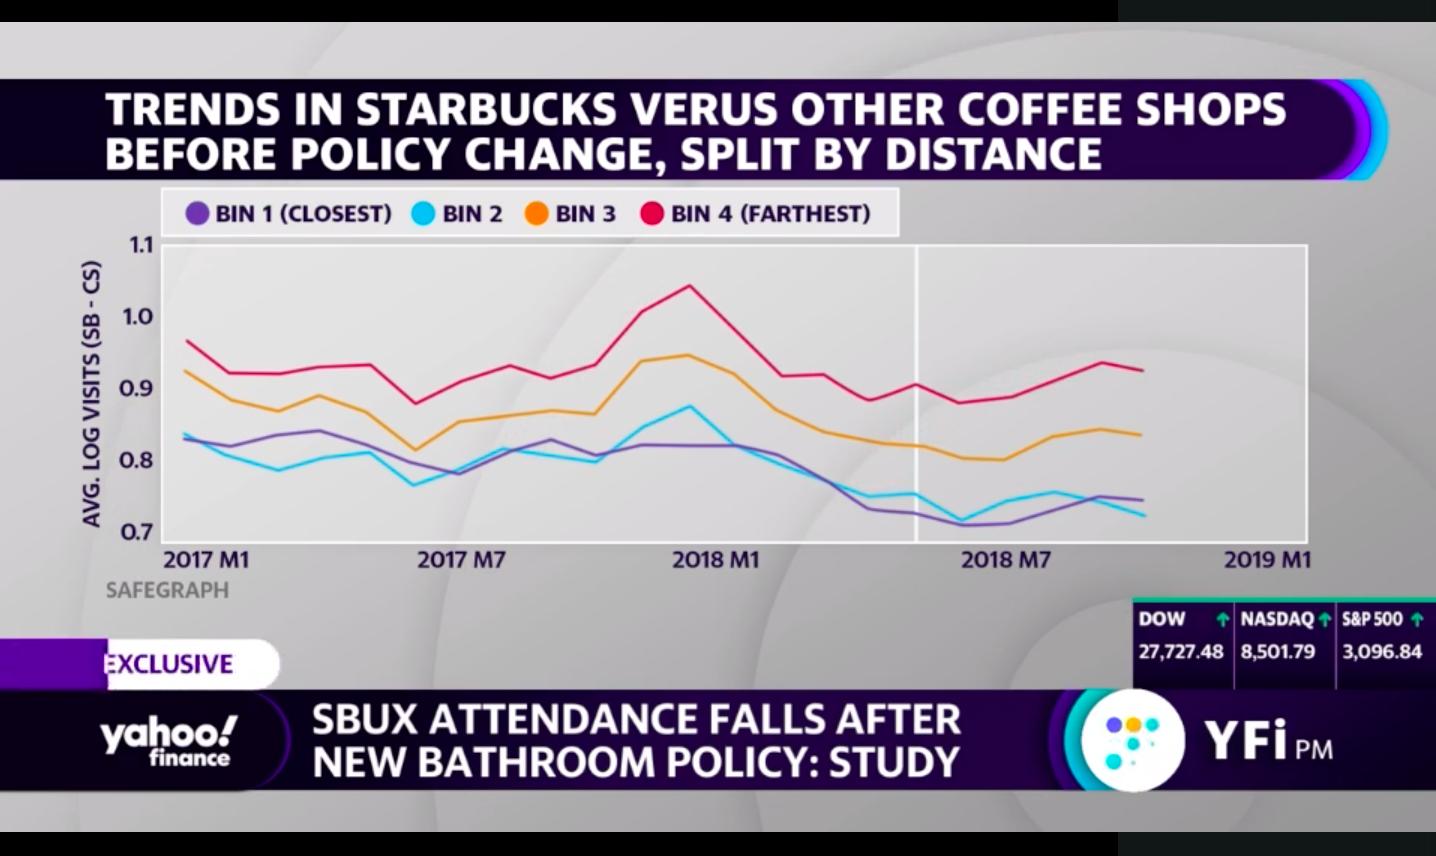 Starbucks foot-traffic insights utilizing SafeGraph data